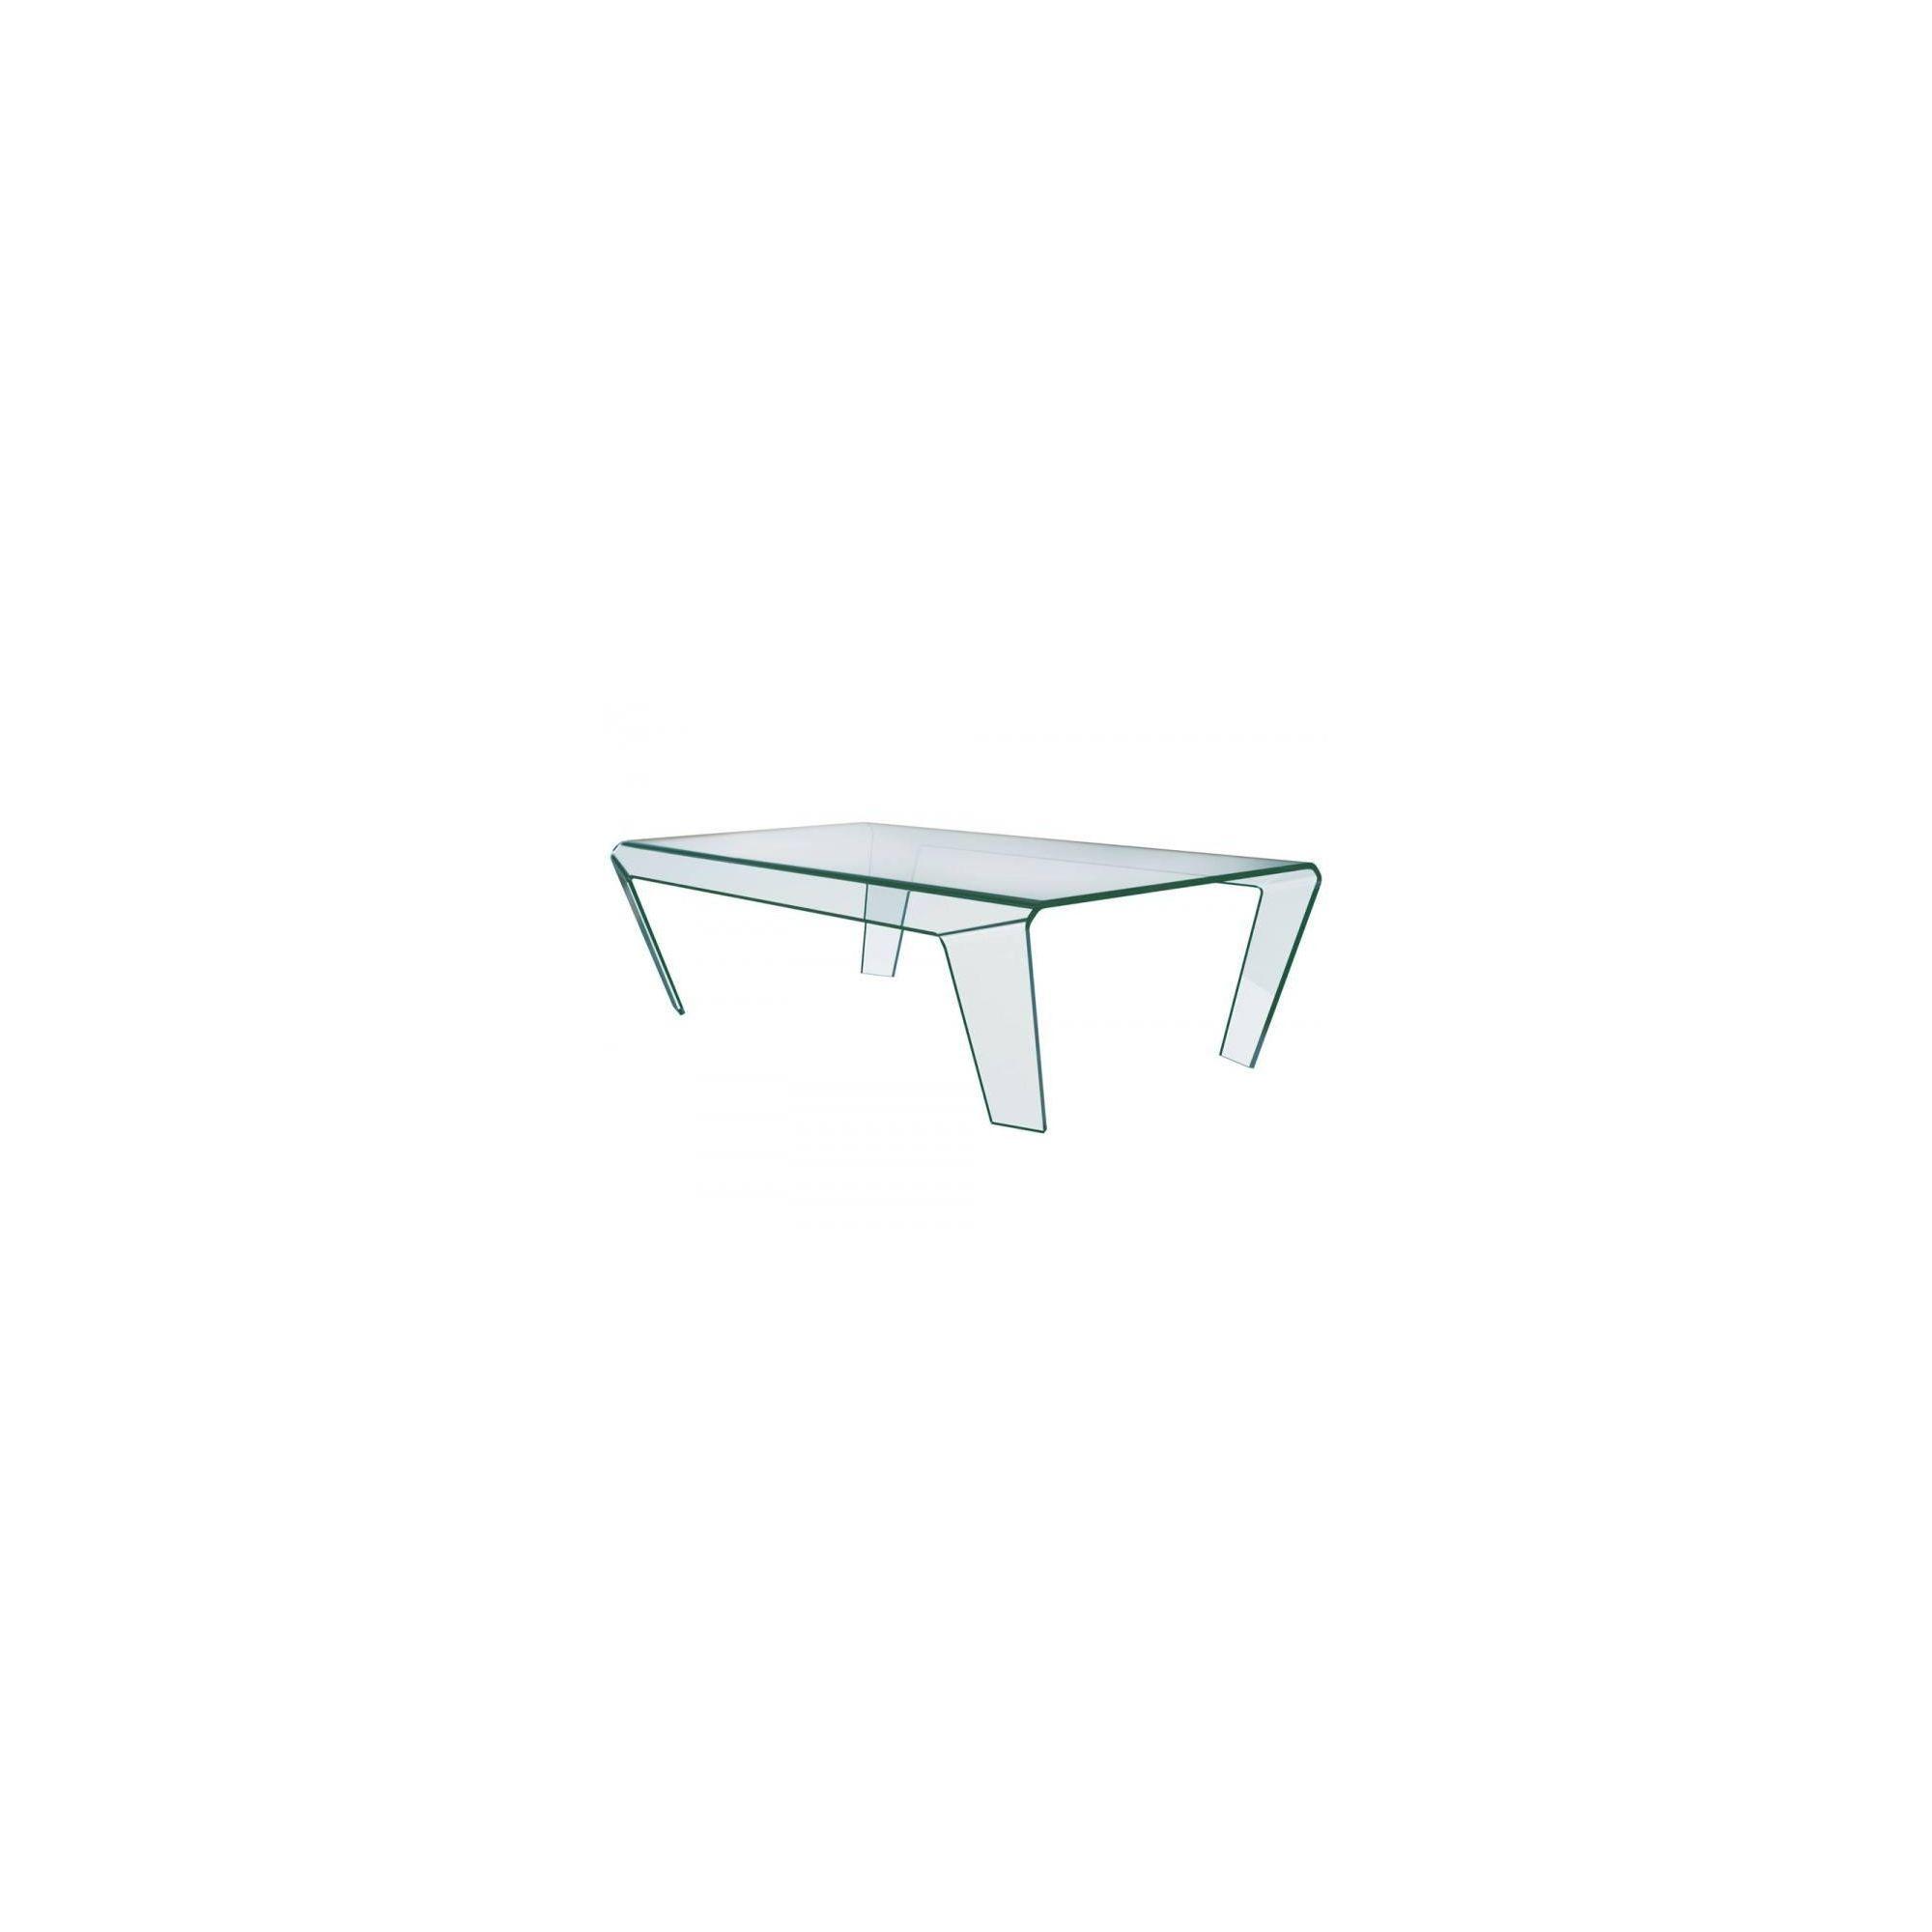 Greenapple xeon glass coffee table at Tesco Direct